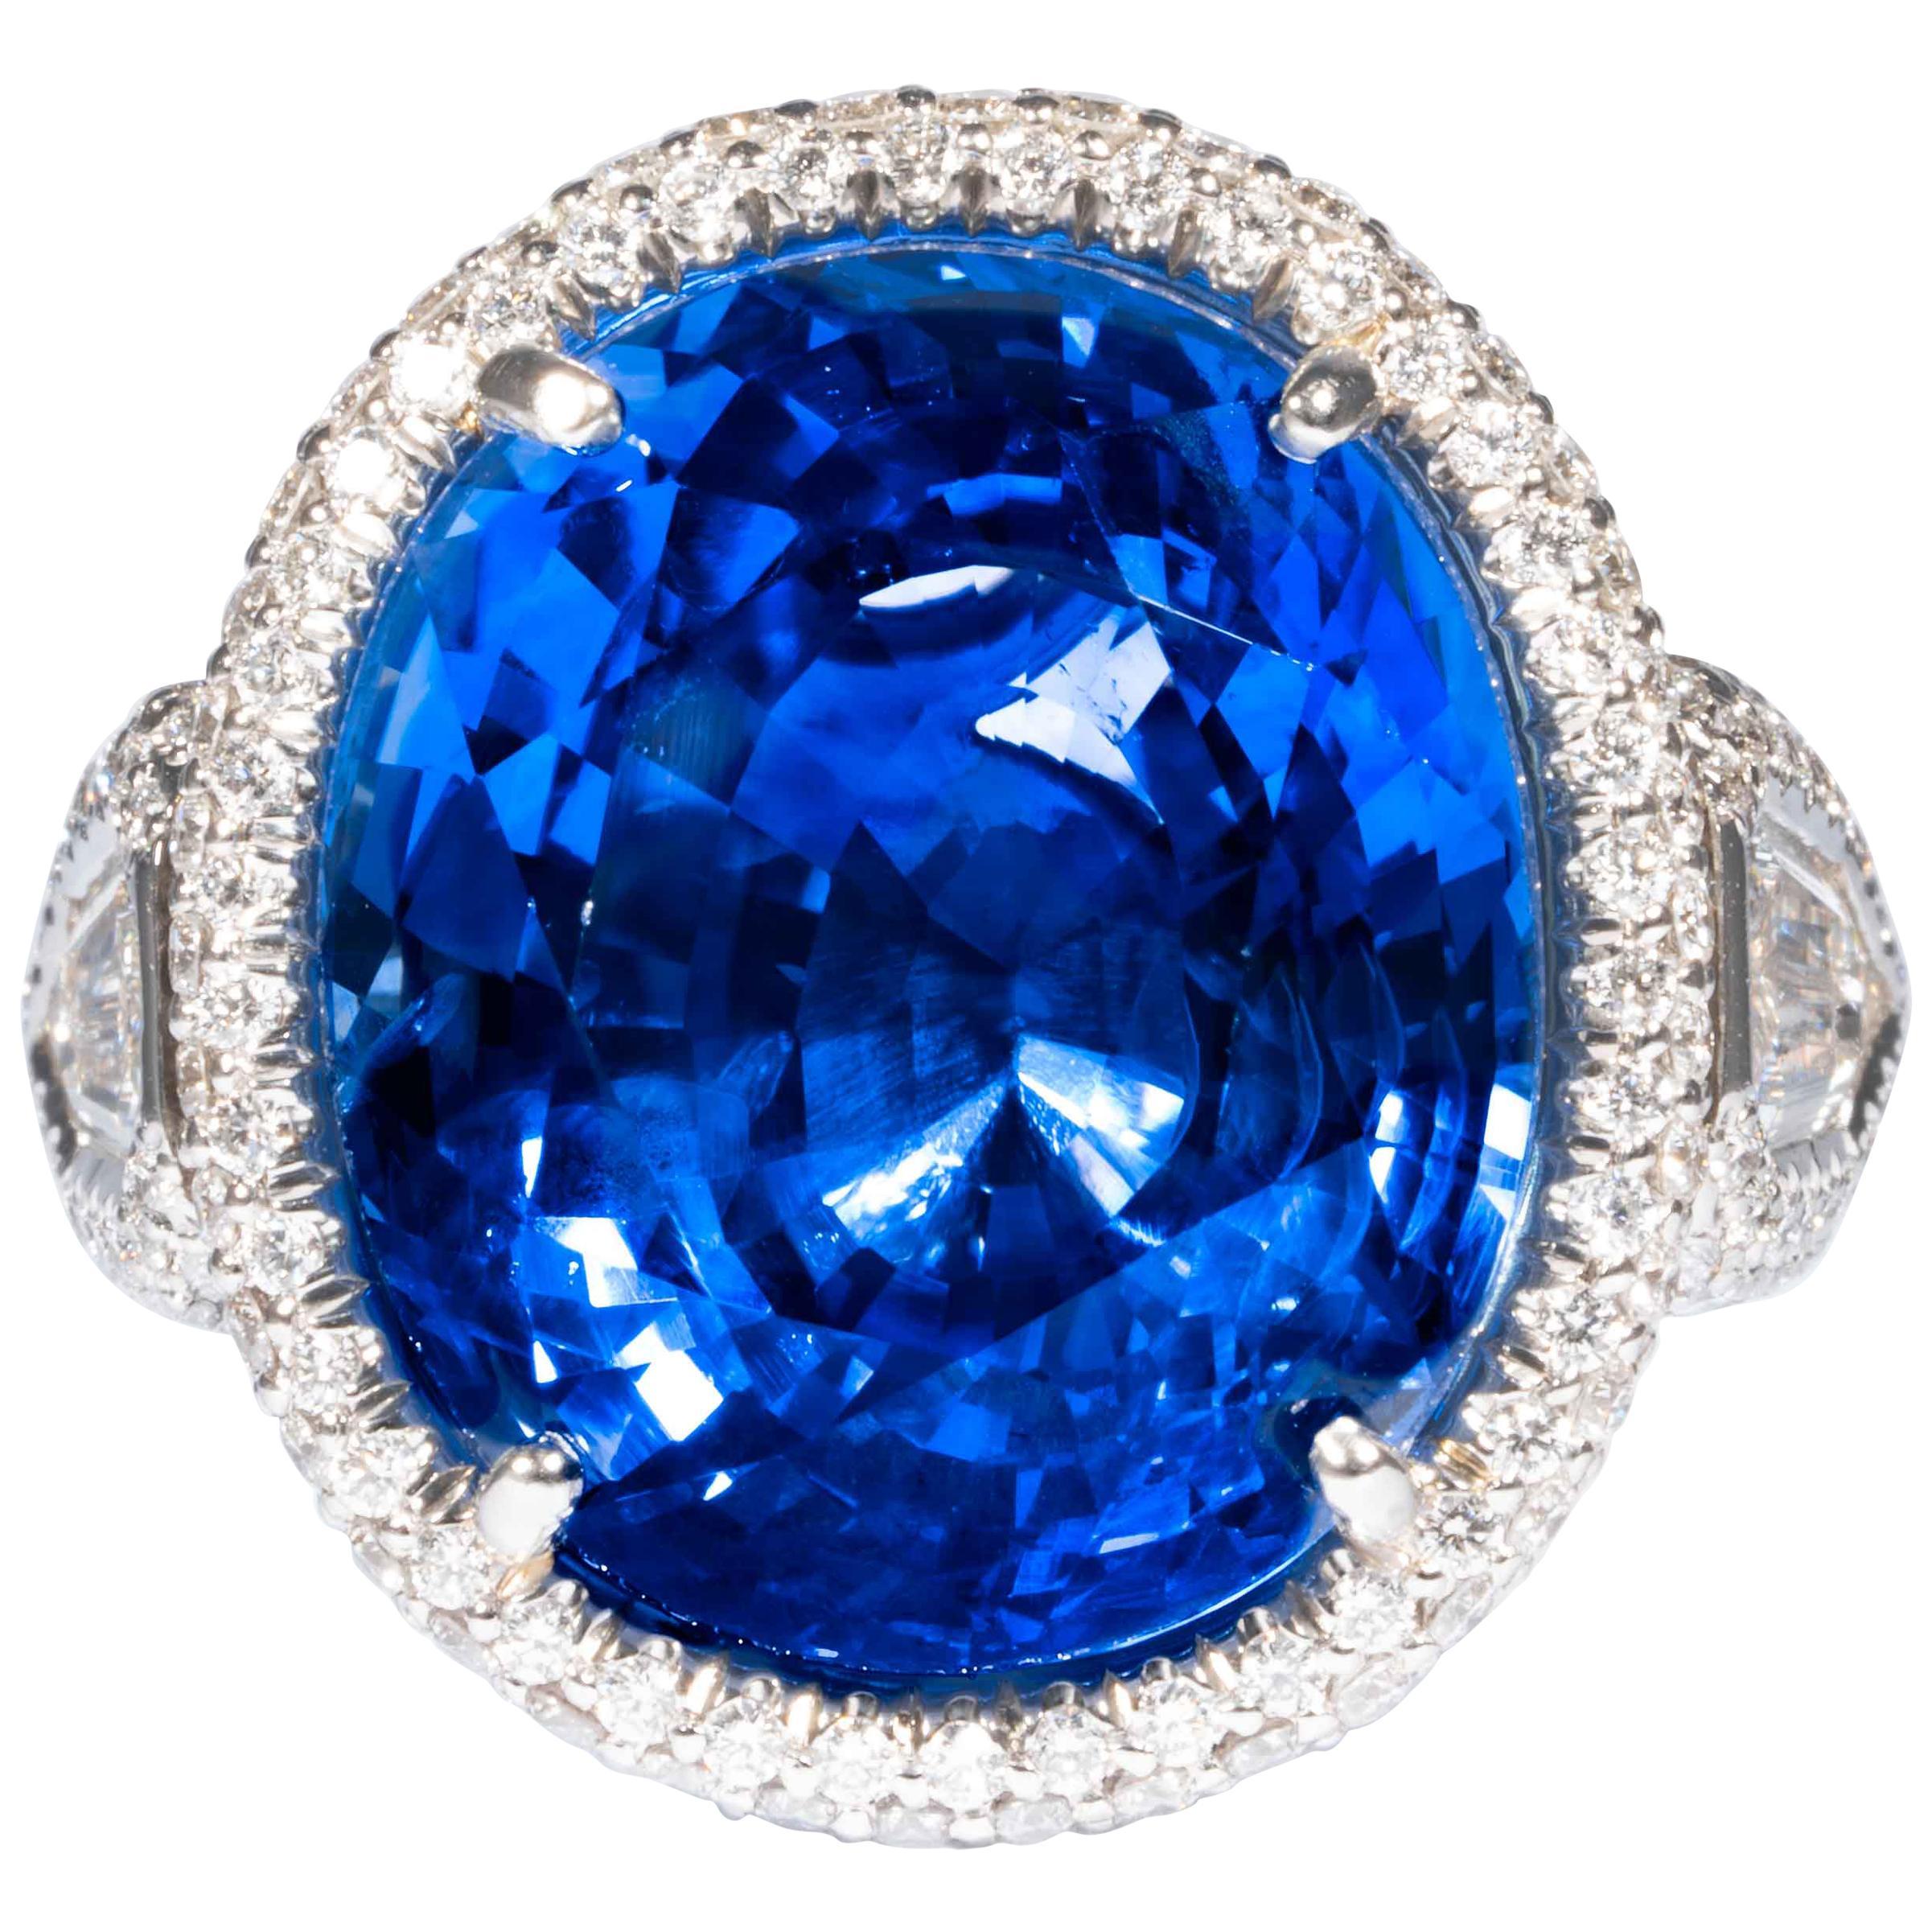 Shreve, Crump & Low 20.86 Carat Blue Sapphire Sapphire and Diamond Platinum Ring